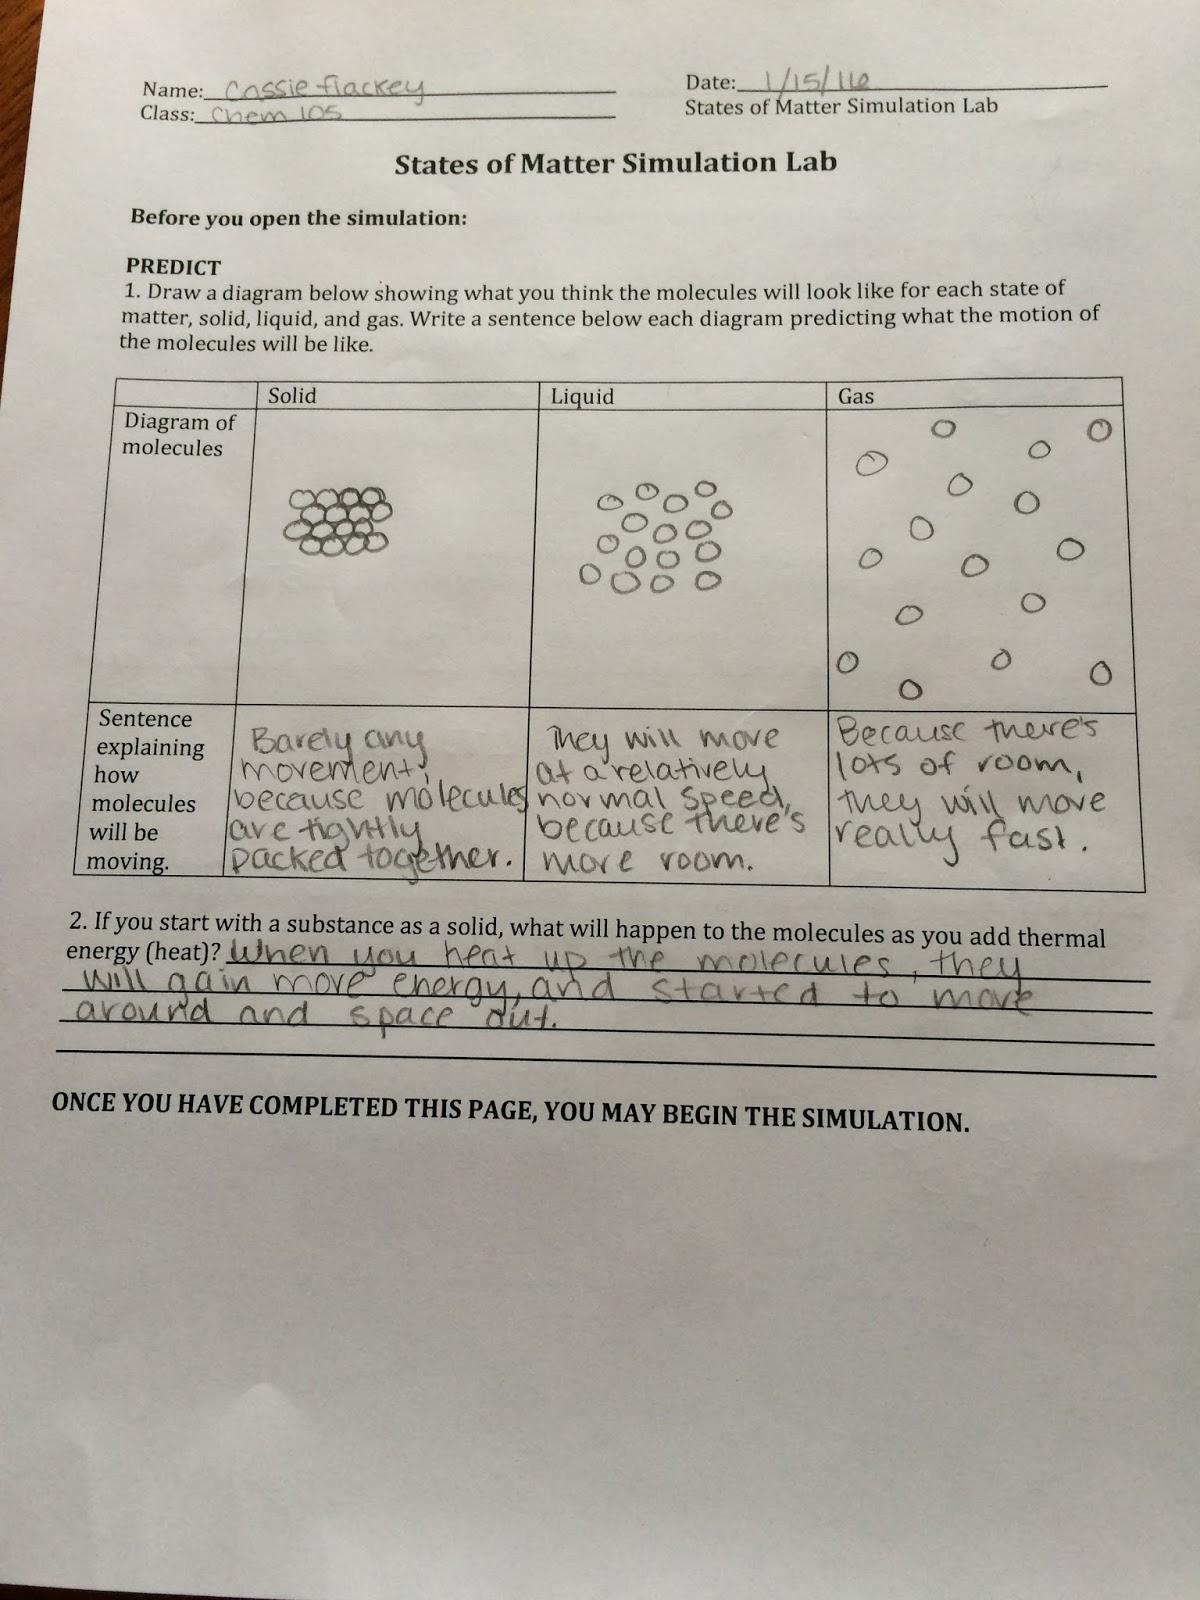 Phet build a molecule simulation dating